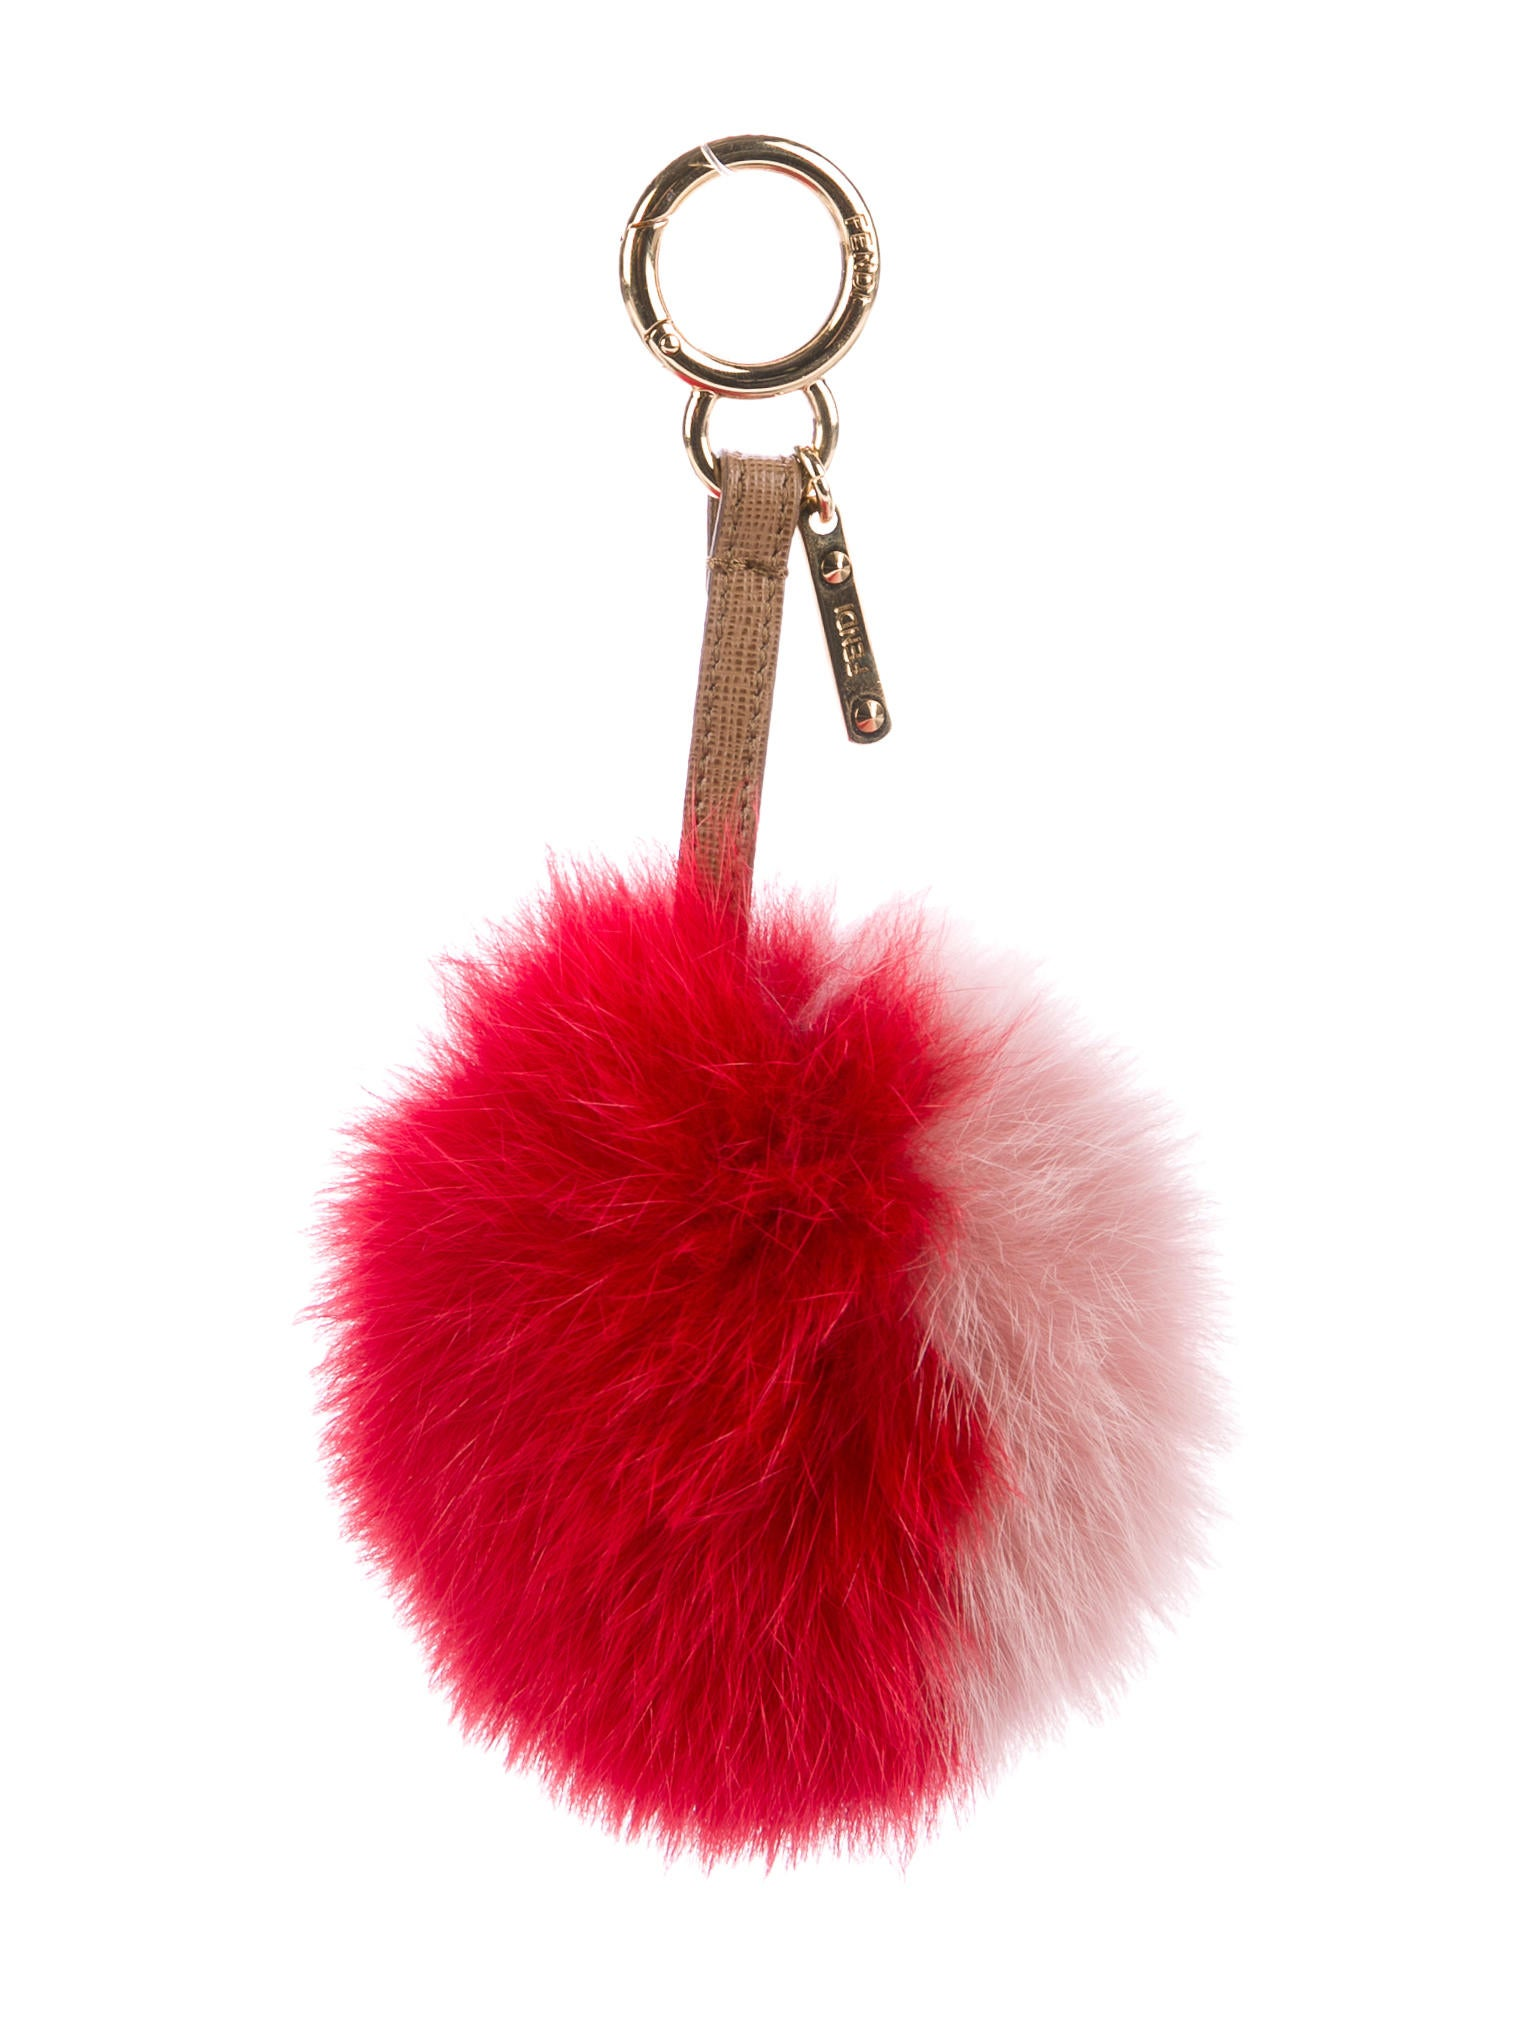 fendi fox fur pom pom bag charm accessories fen63833